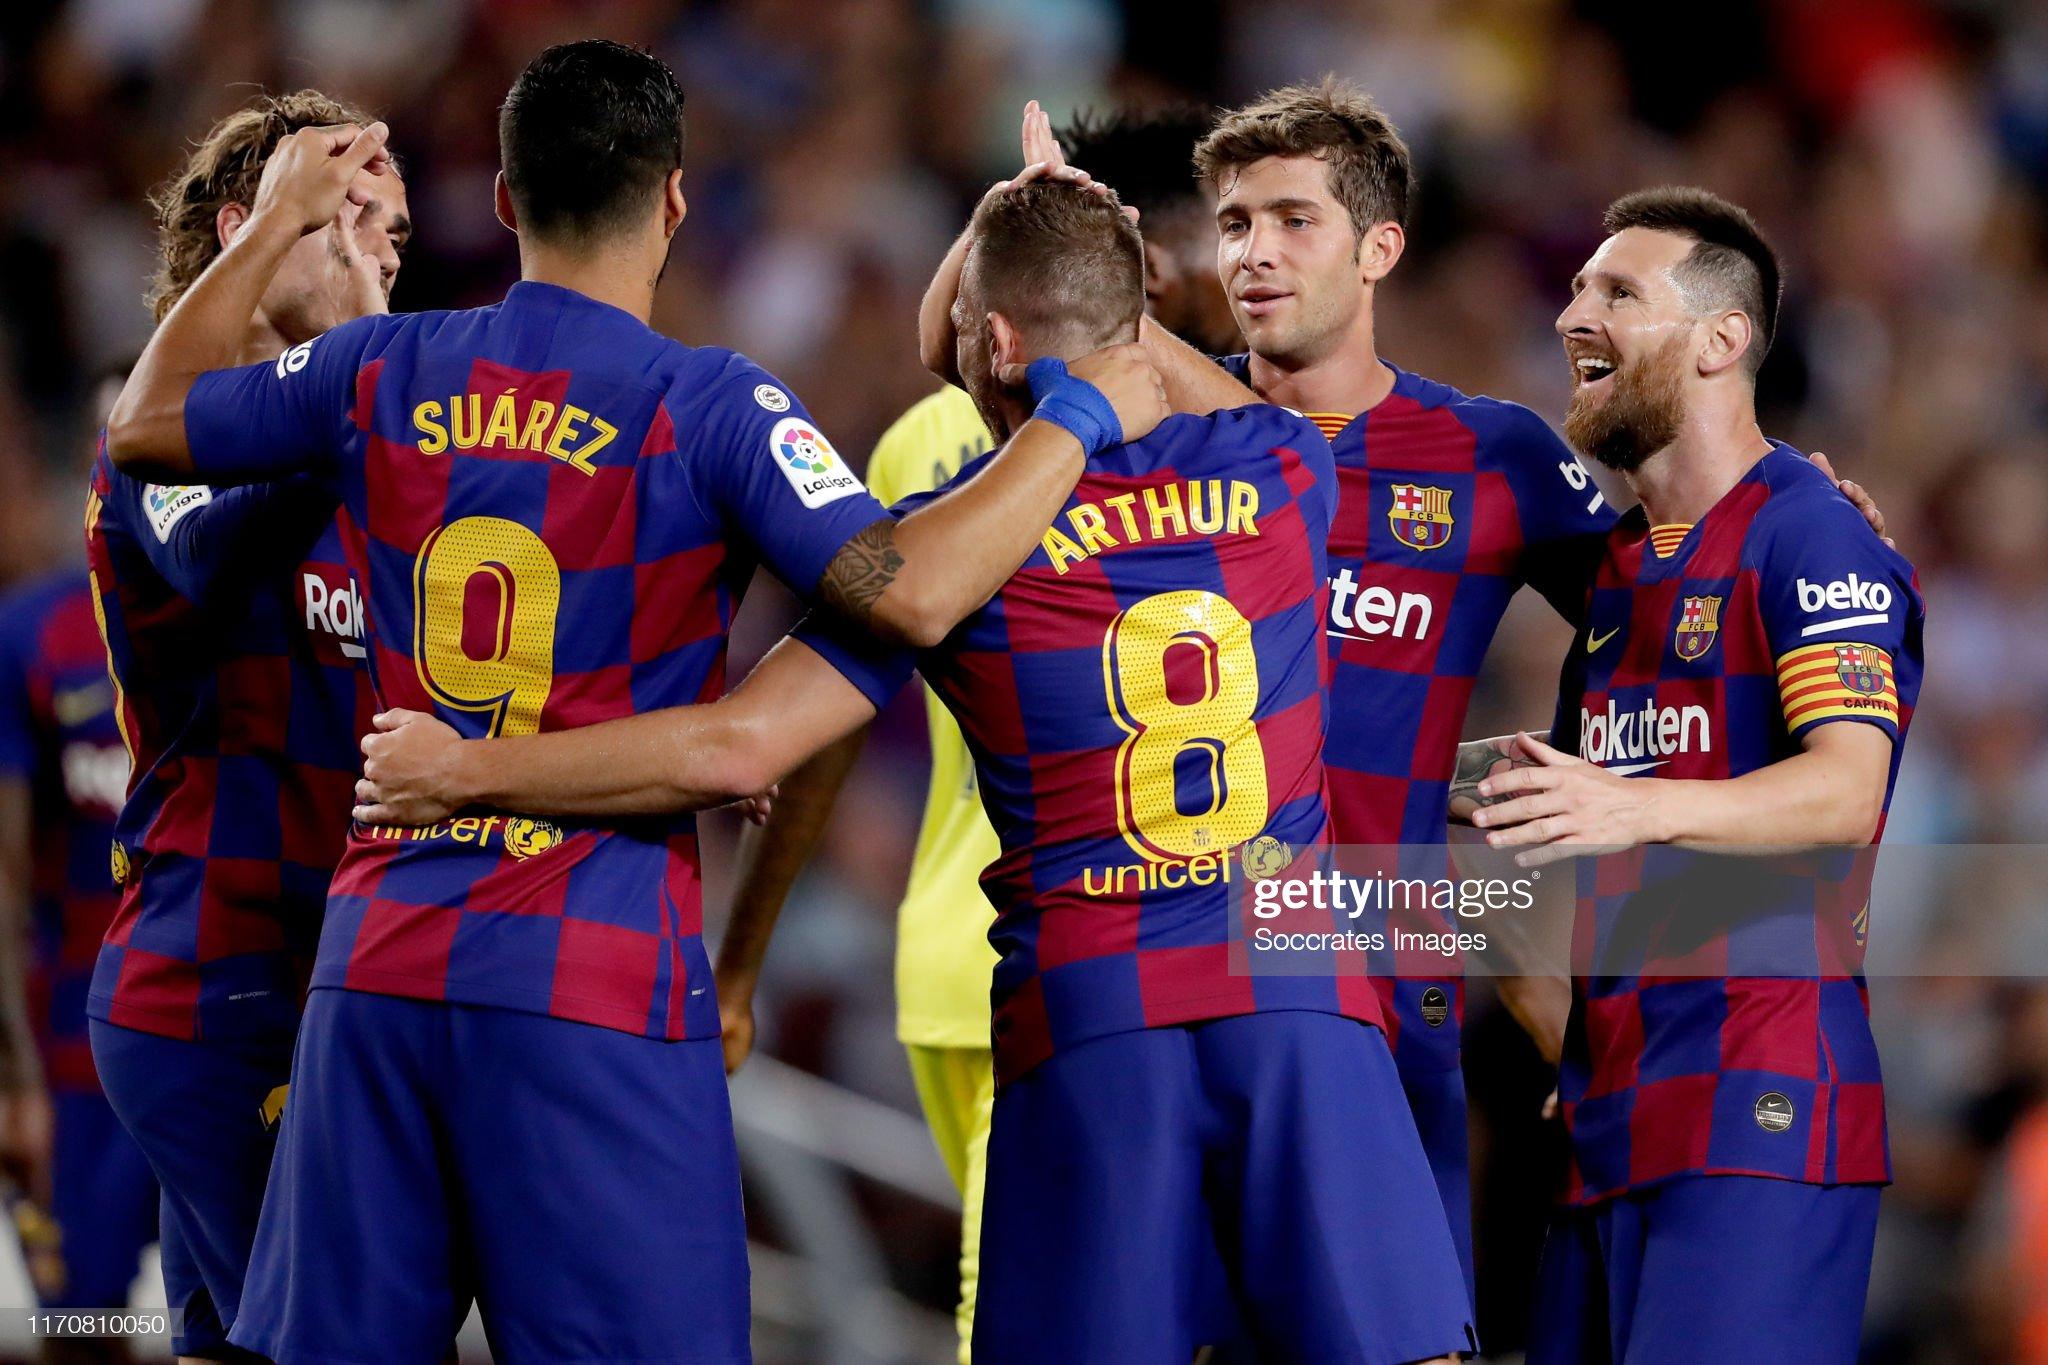 صور مباراة : برشلونة - فياريال 2-1 ( 24-09-2019 )  Antoine-griezmann-of-fc-barcelona-luis-suarez-of-fc-barcelona-arthur-picture-id1170810050?s=2048x2048